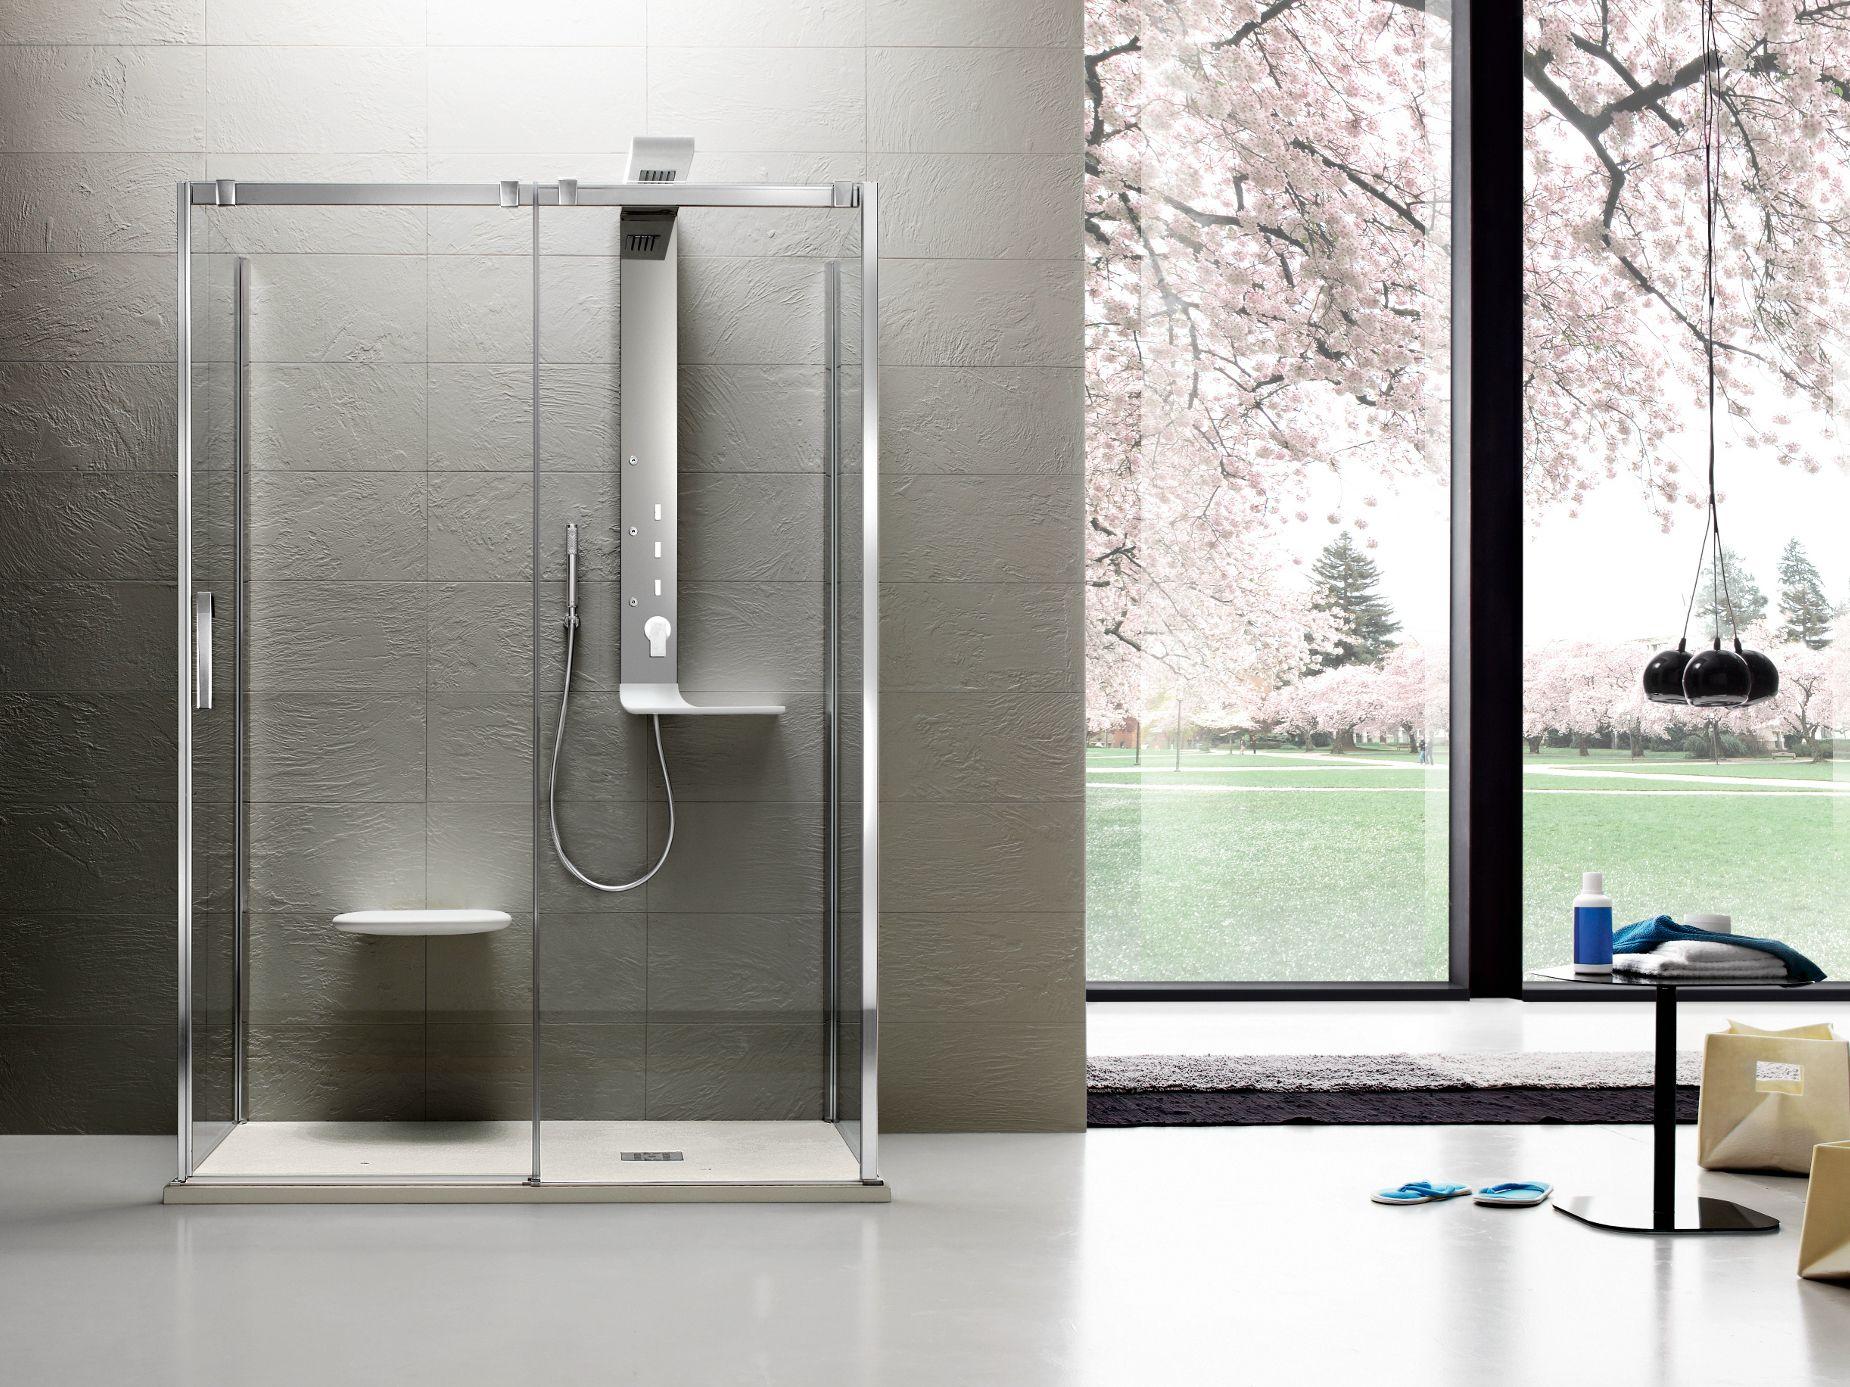 Otto premium cabine de douche by arblu - Porte de douche en verre ...